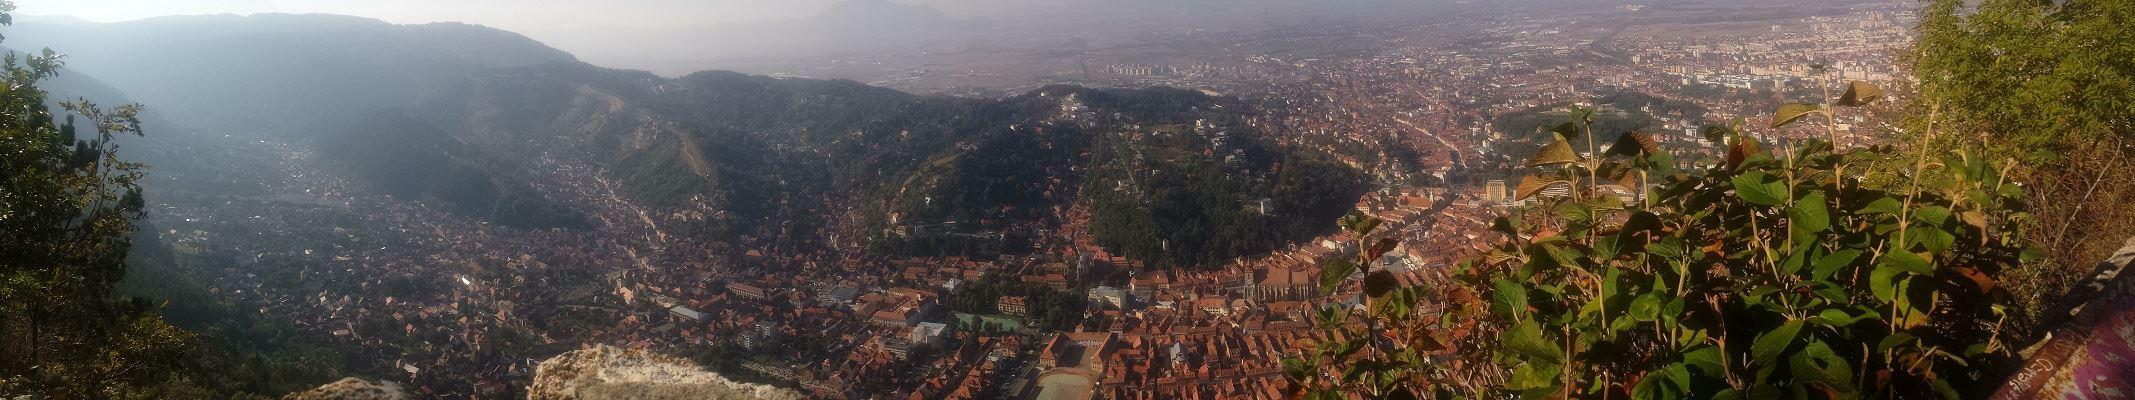 tampa-brasov-panorama